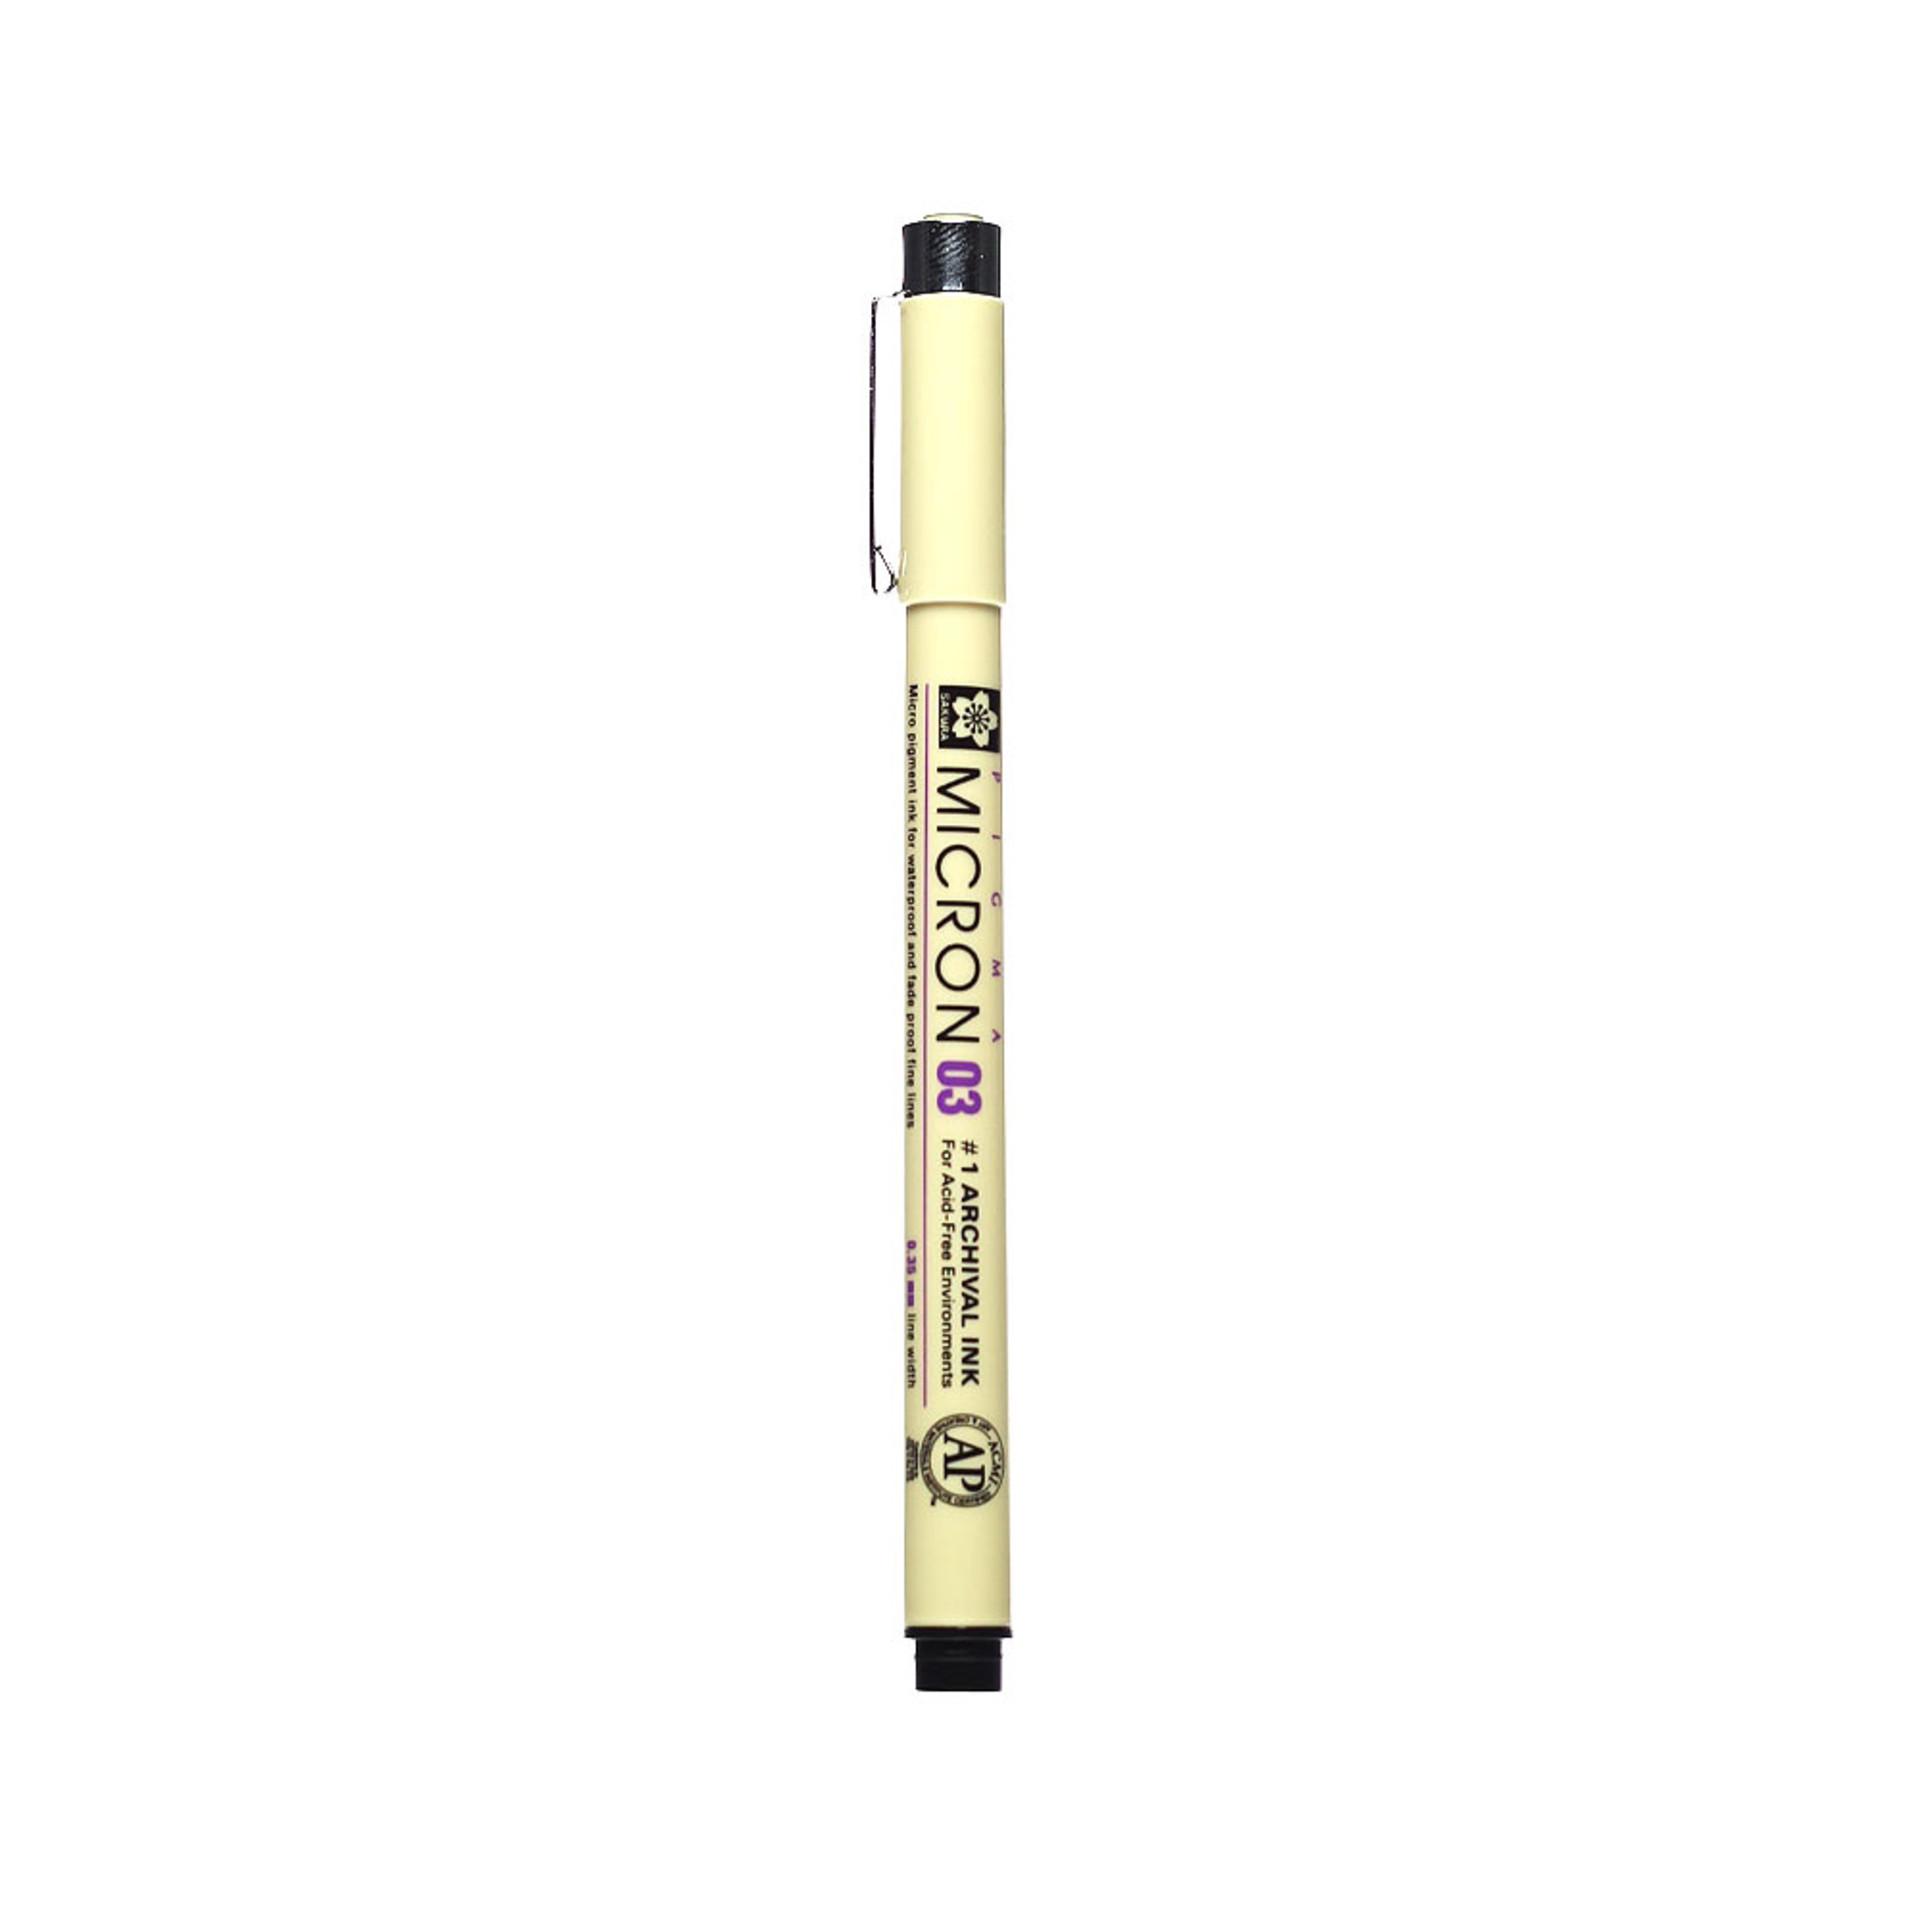 Sakura Pigma Micron 03 .35mm Pen – Black